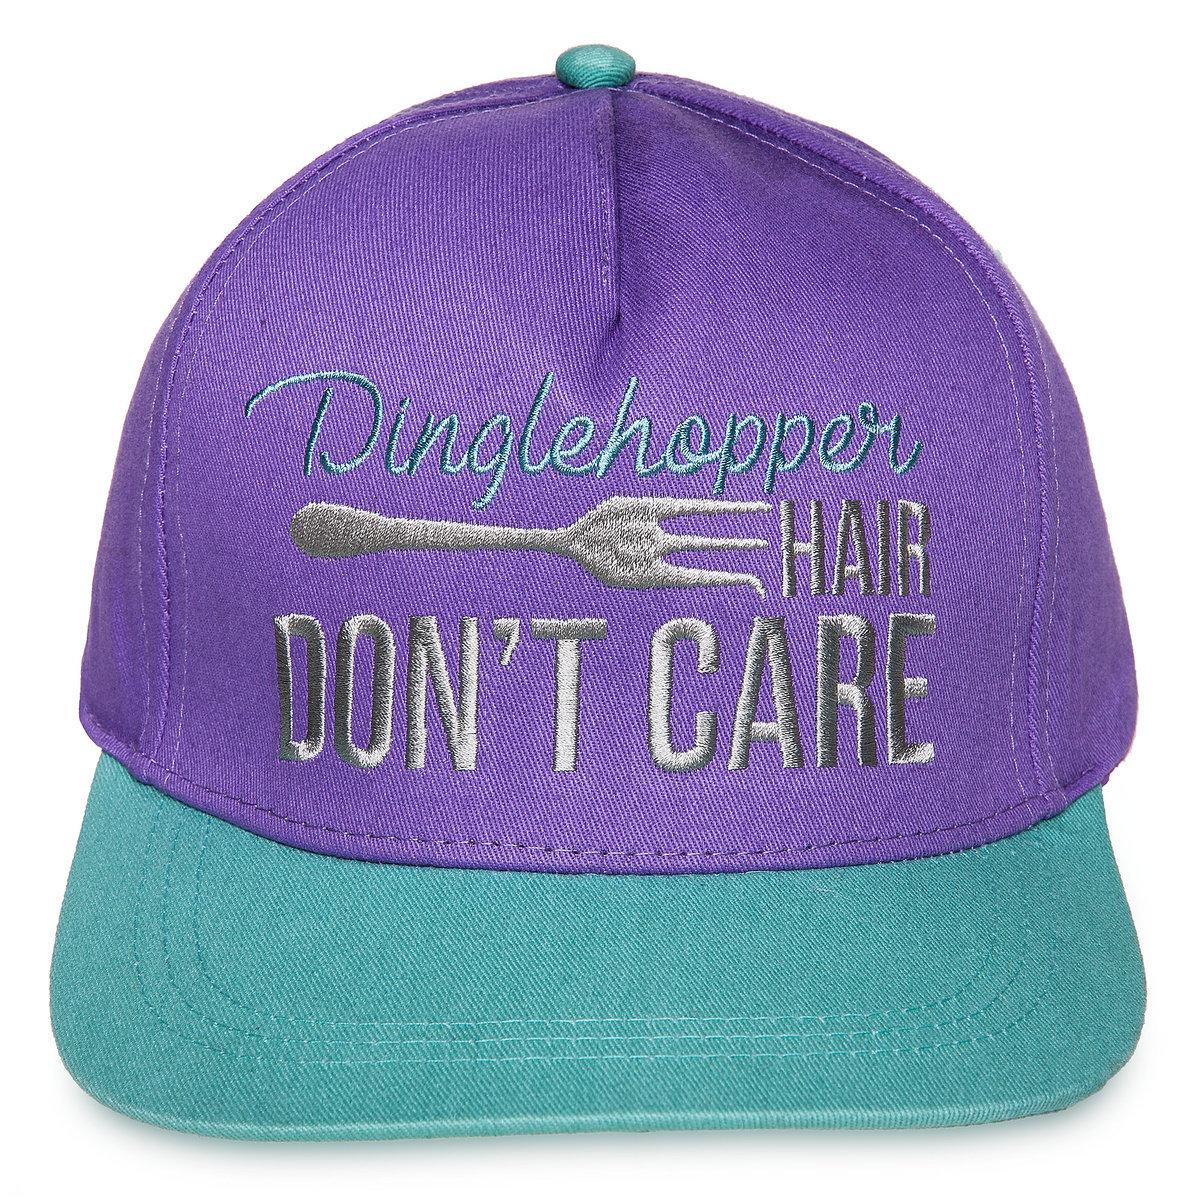 Disney Baseball Cap - Dinglehopper Hair Don t Care - Little Mermaid 991cc173597